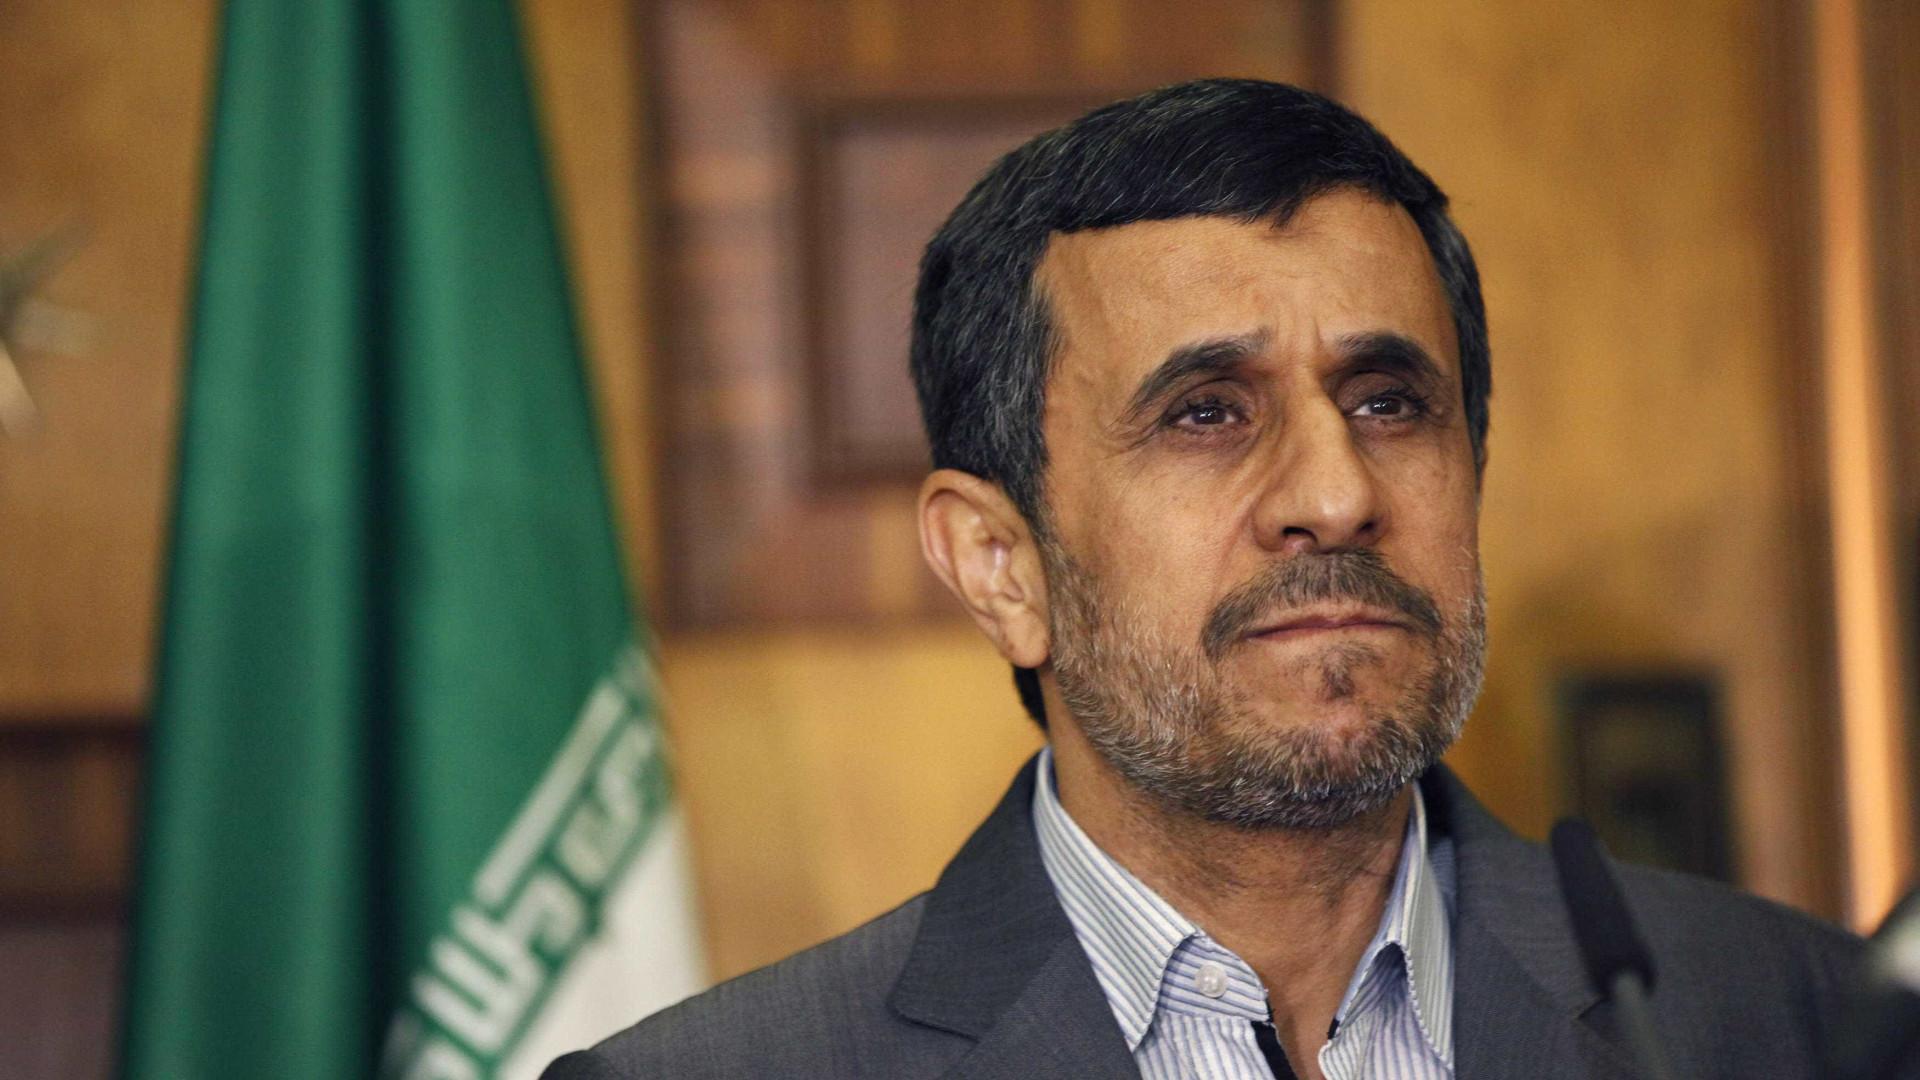 'Guardiões' barram candidatura de Ahmadinejad no Irã